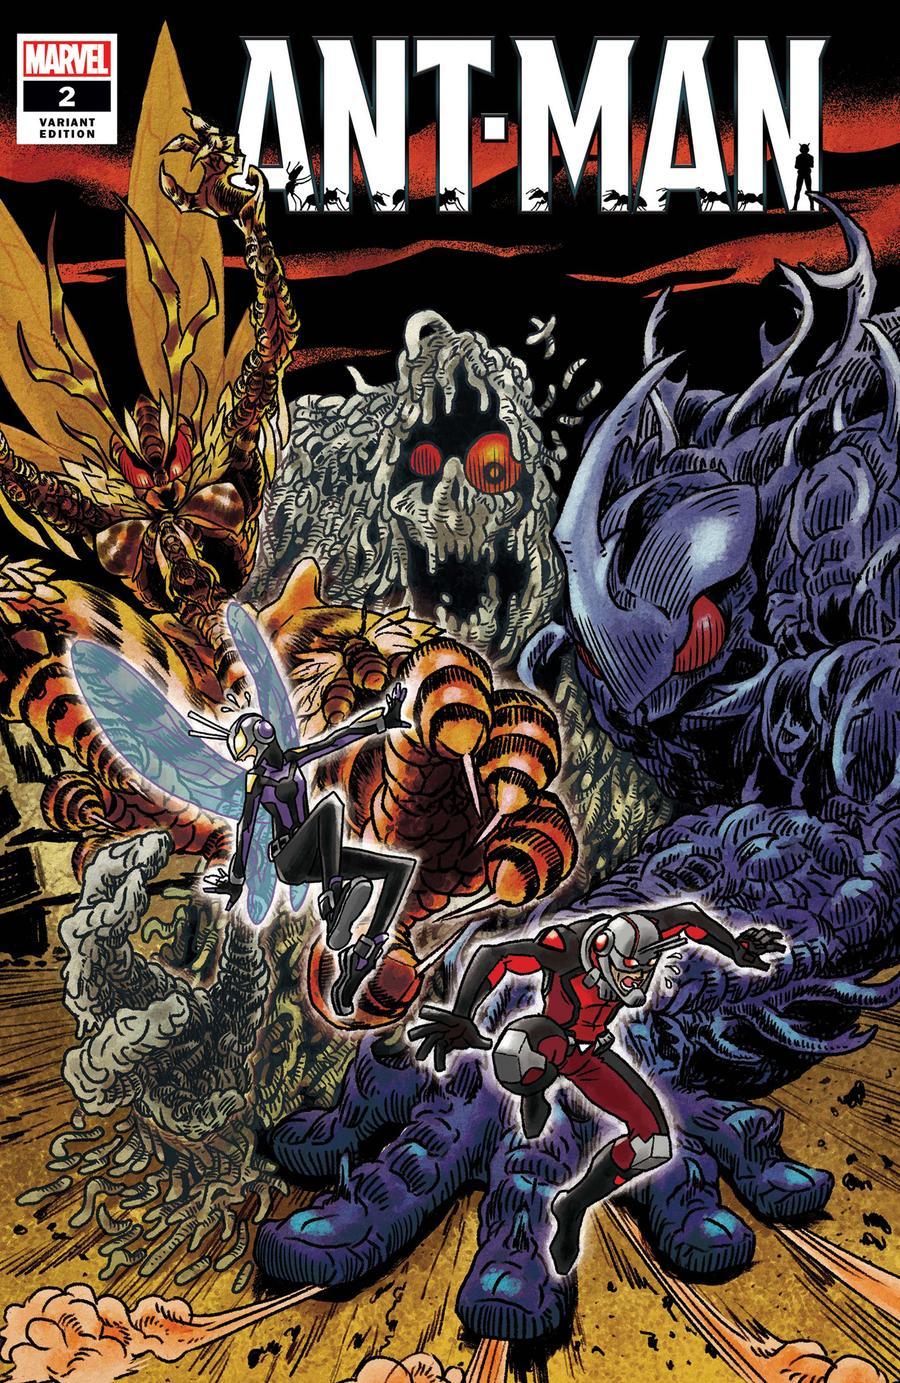 Ant-Man Vol 2 #2 Cover B Incentive Superlog Variant Cover